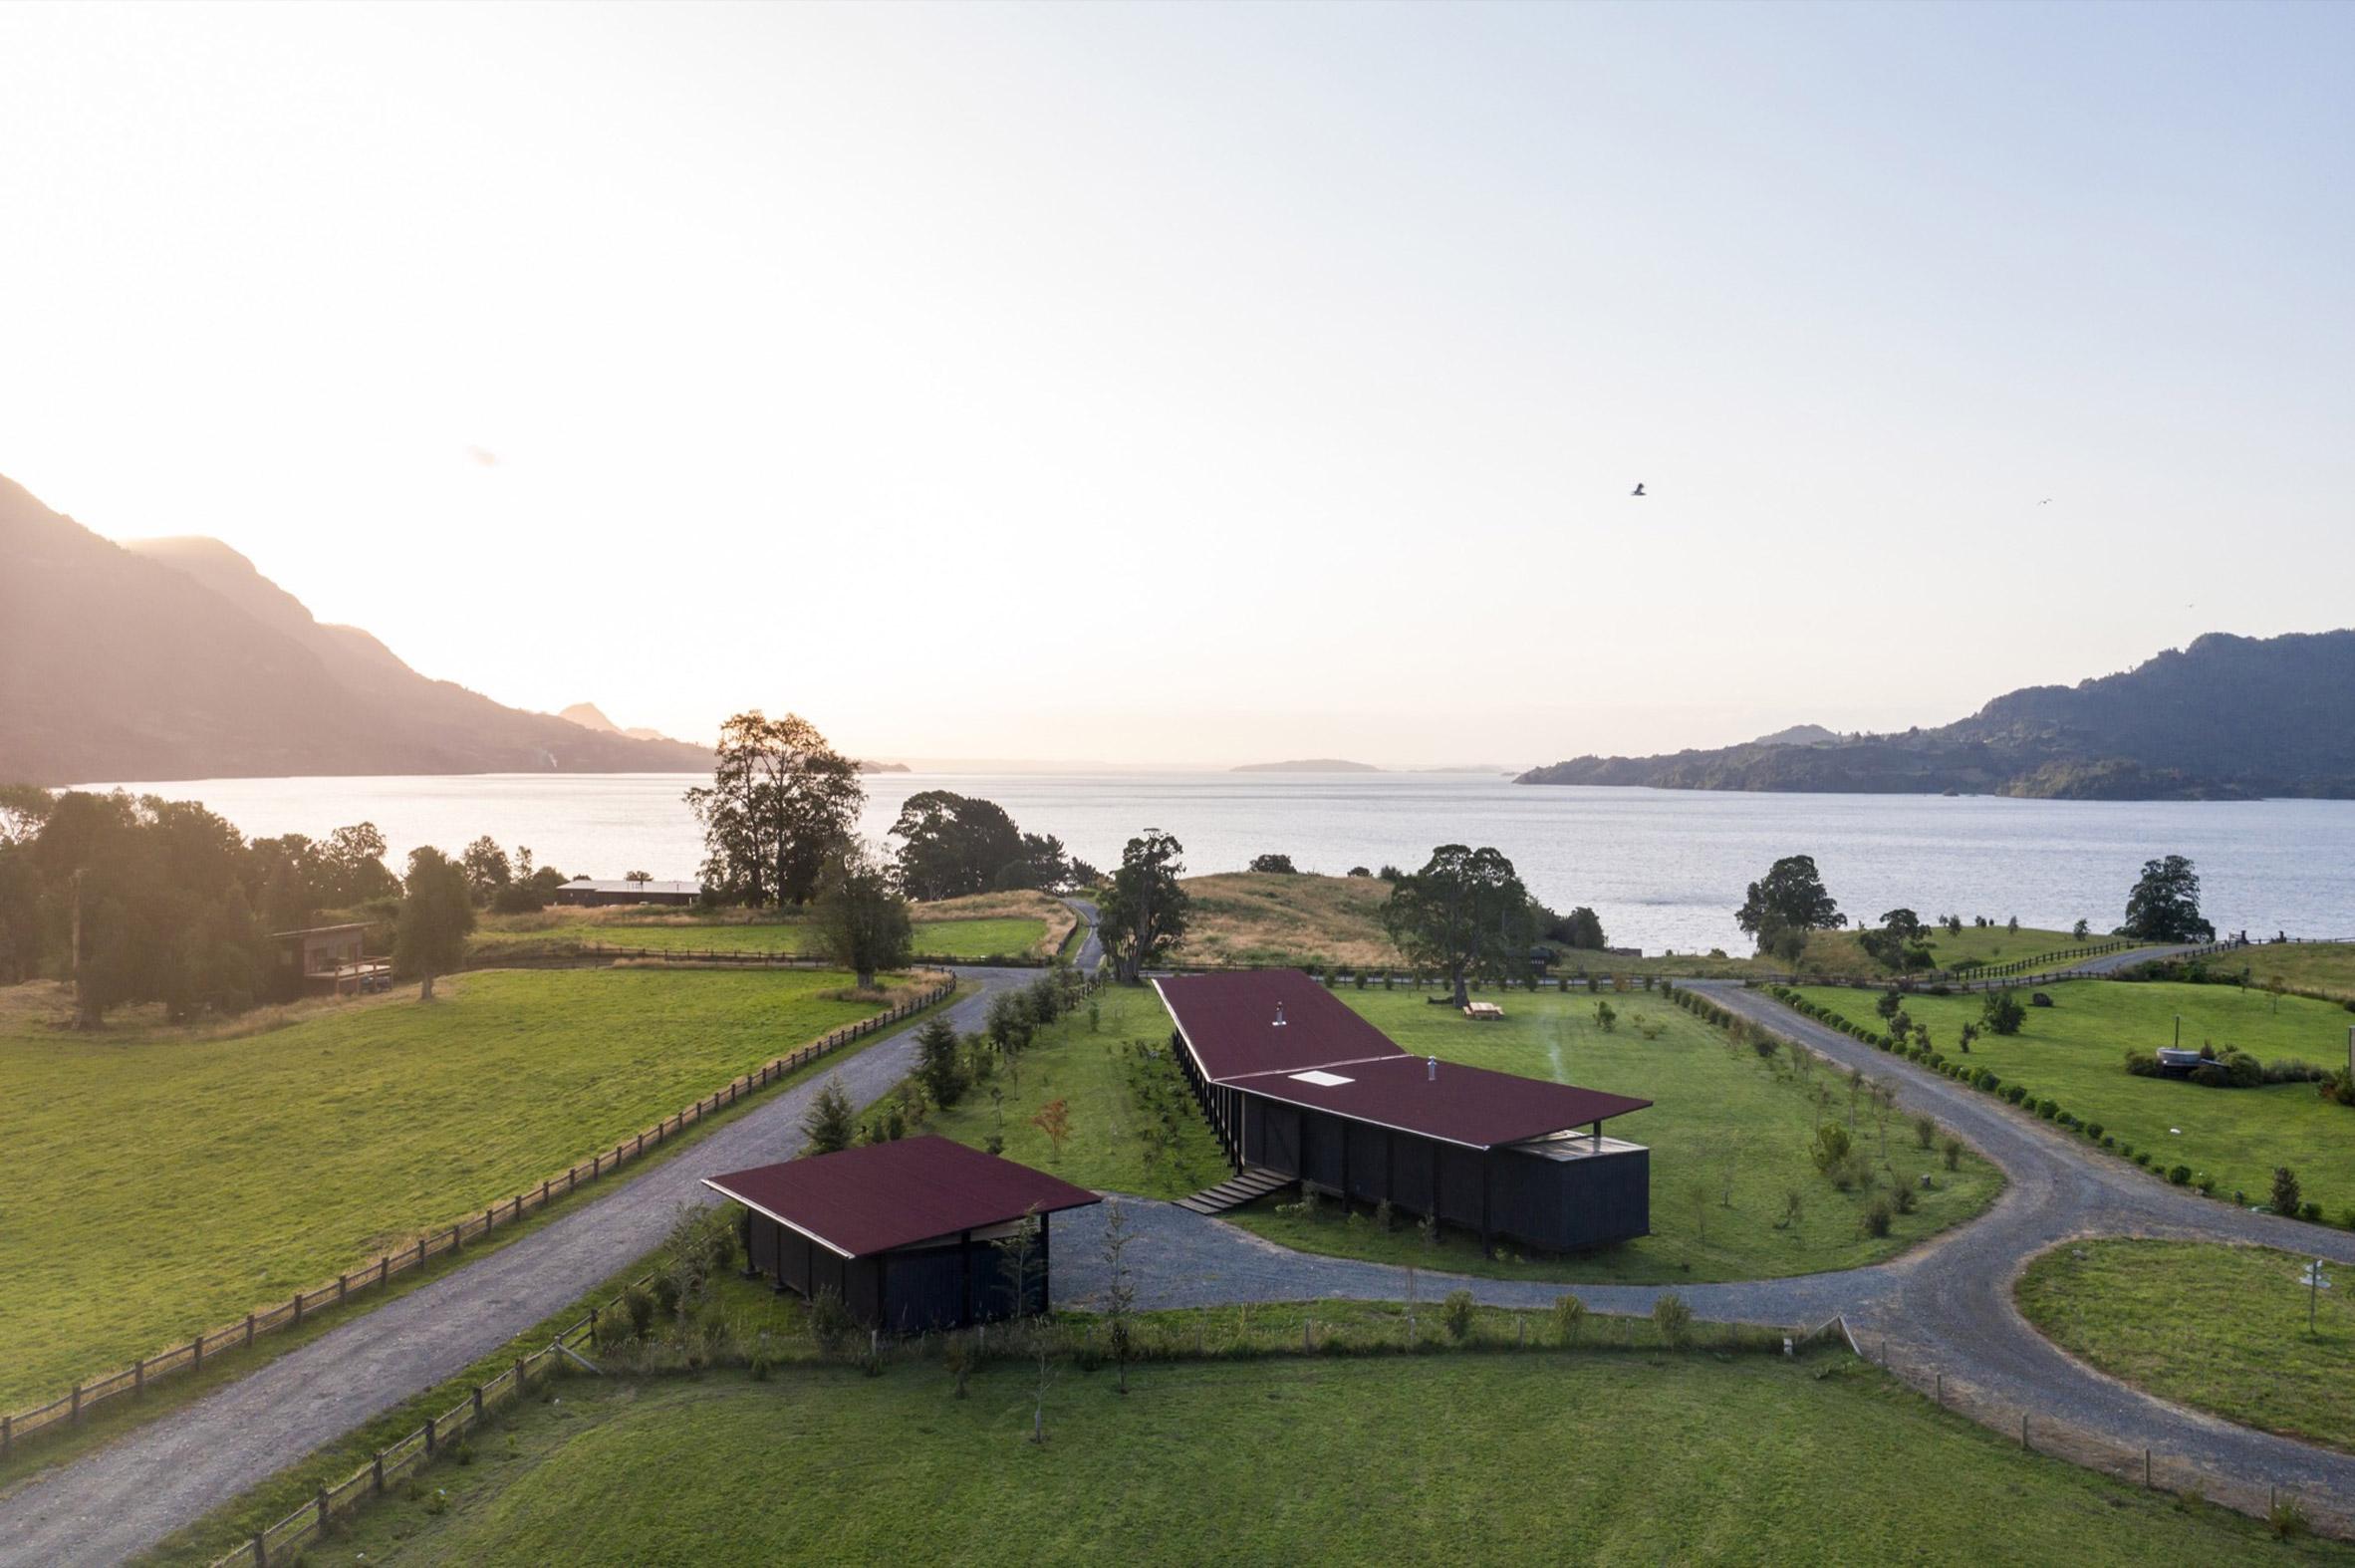 Aerial view of Casa Tobita in Lago Ranco Chile